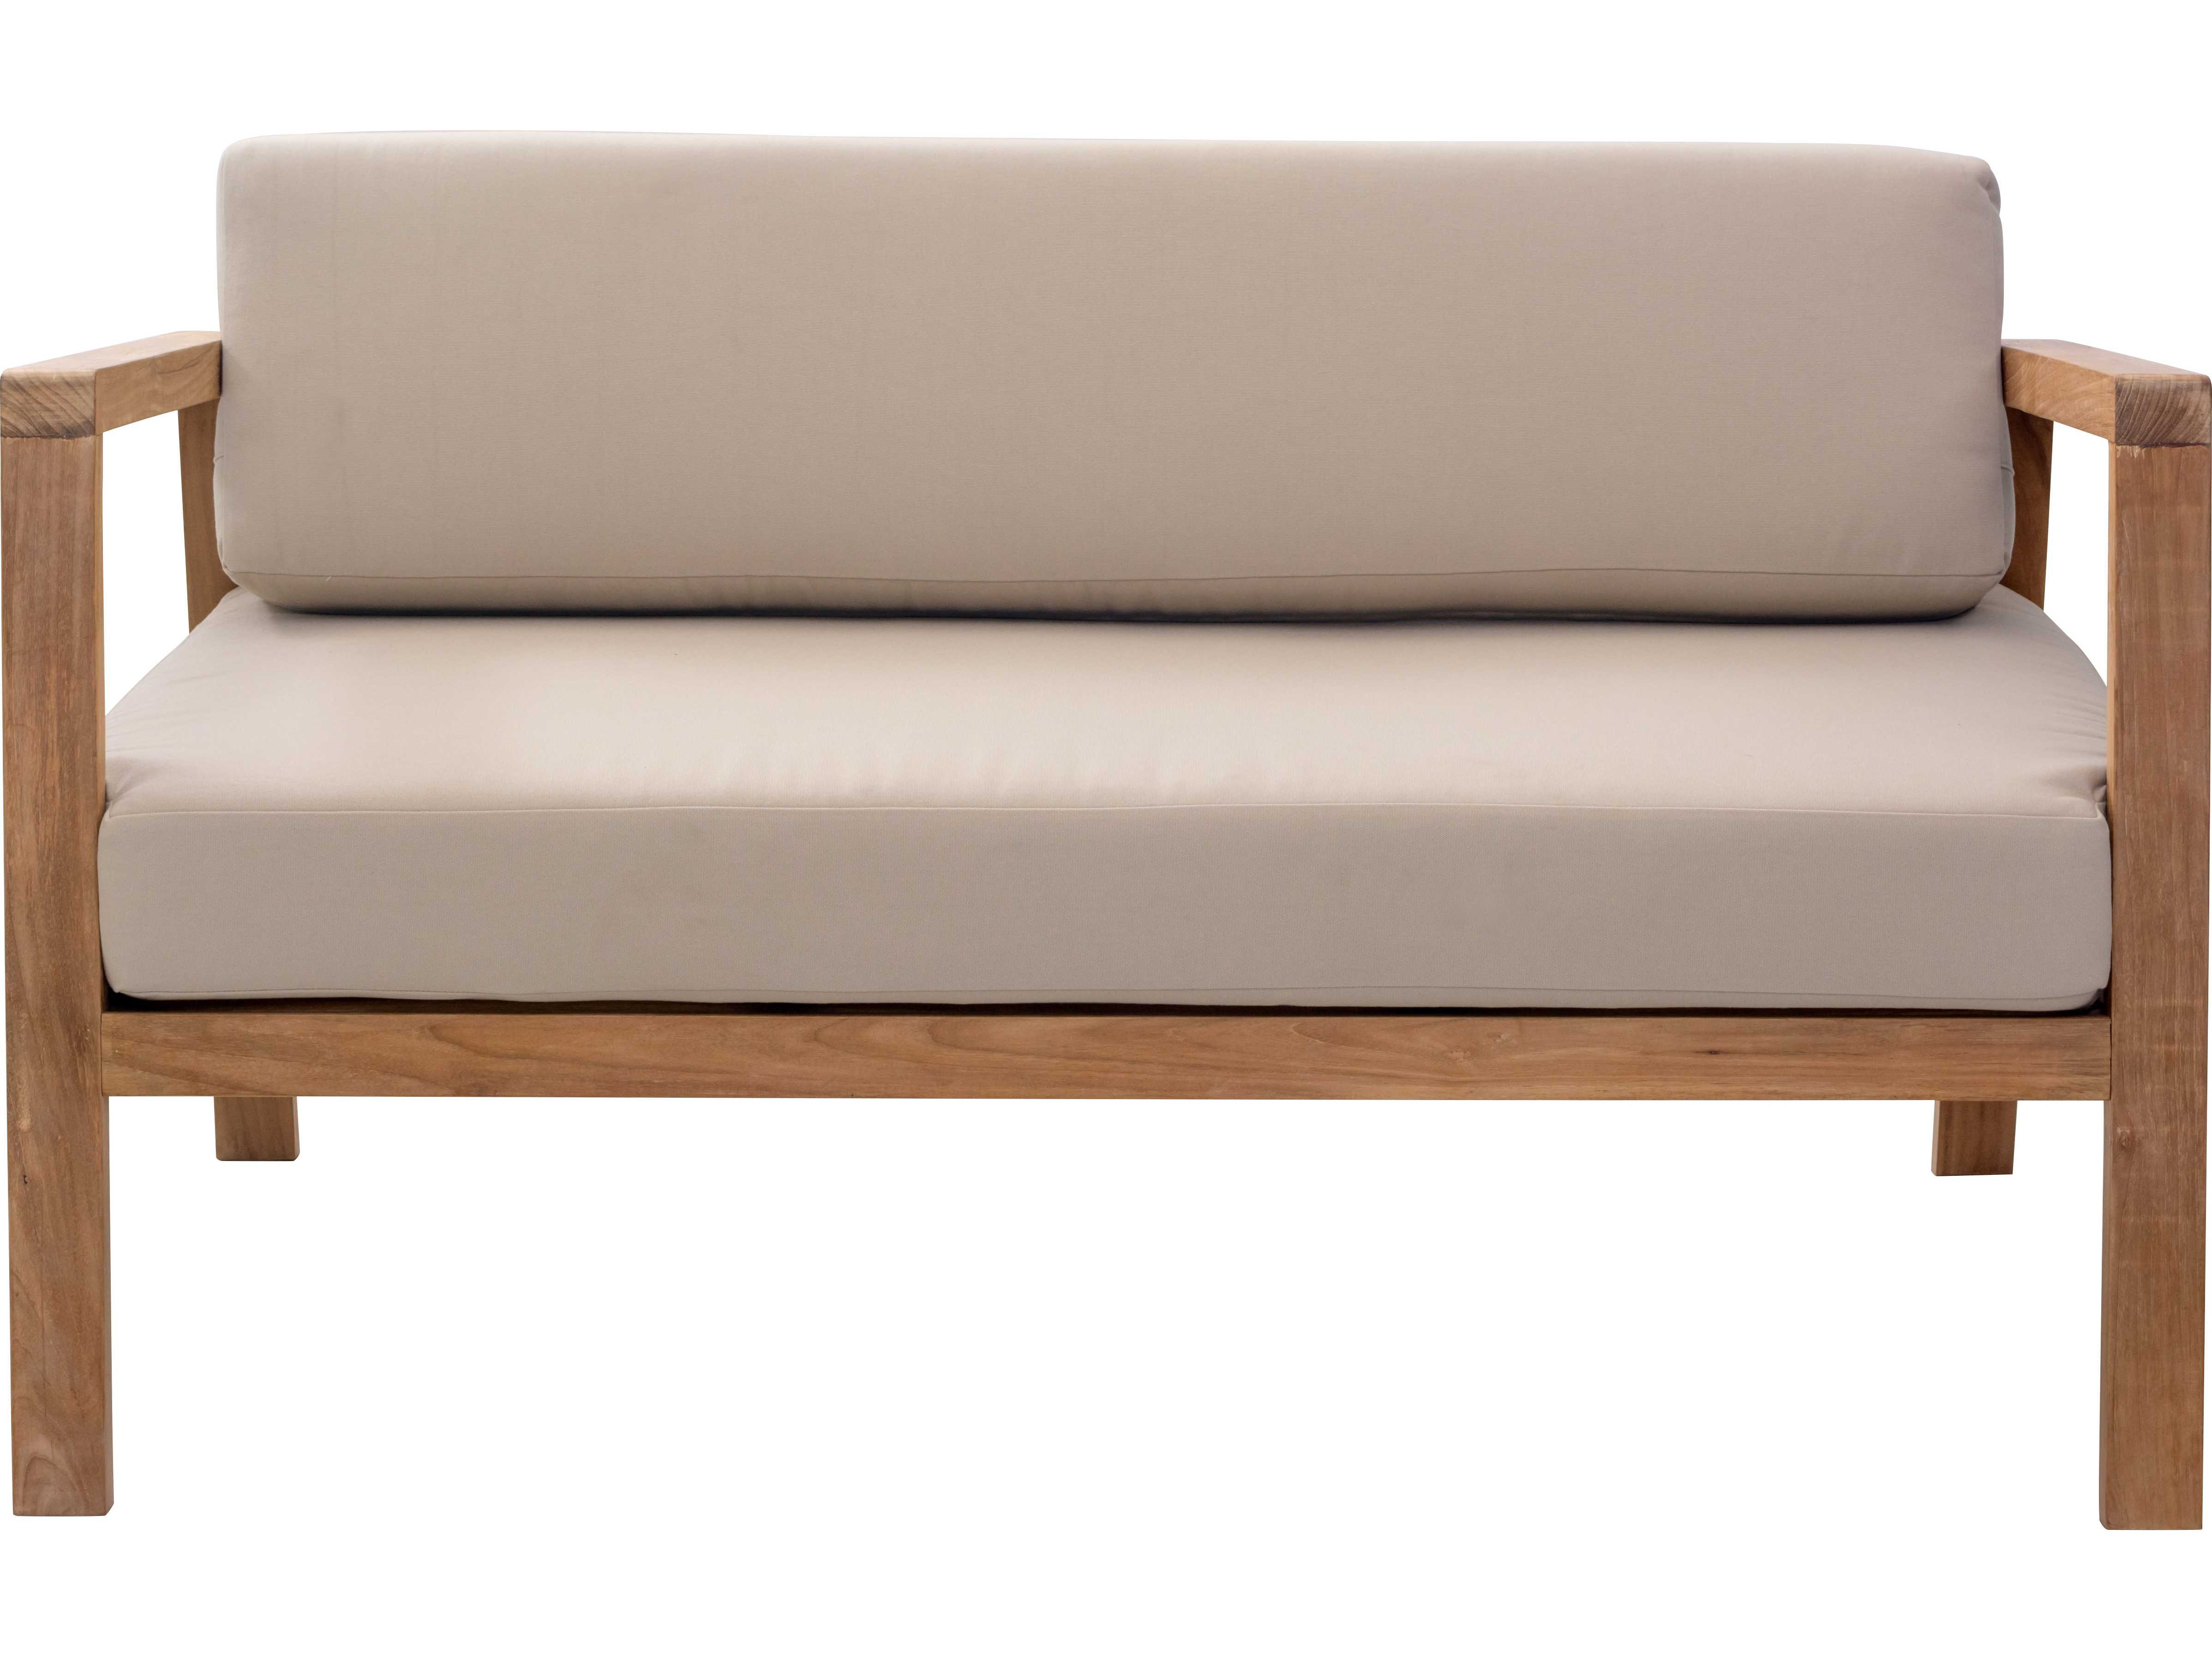 Zuo Outdoor Bilander Teak Sofa in Natural